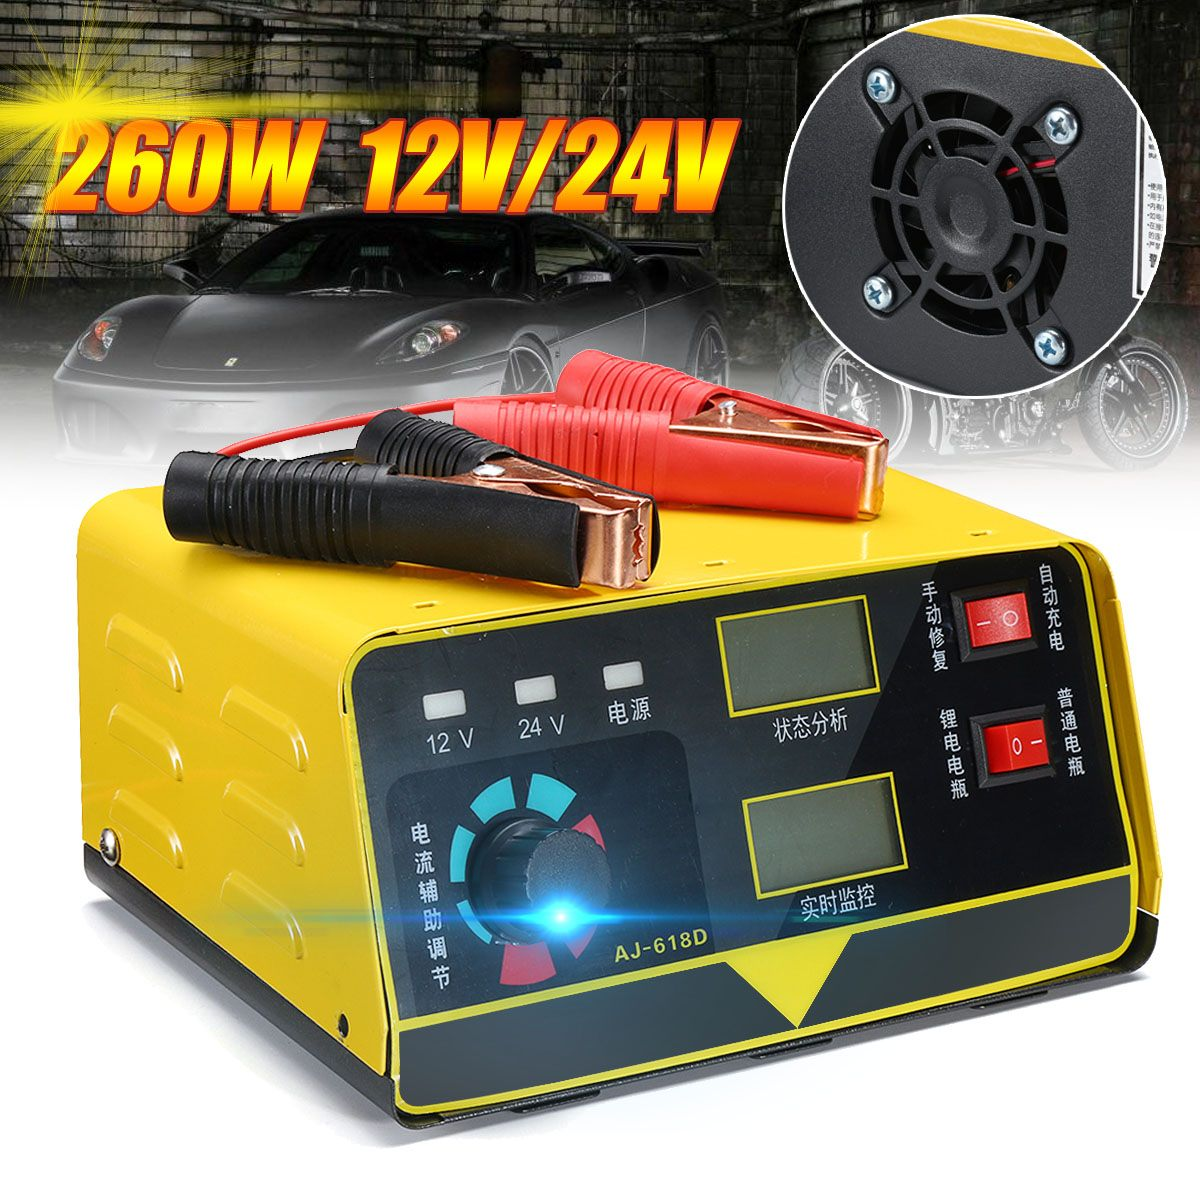 Auto Batterie Ladegerät 12V 24V Voll Automatische Motorrad Elektrische 400AH Auto Batterie Ladegerät Geräuscharm + Adapter